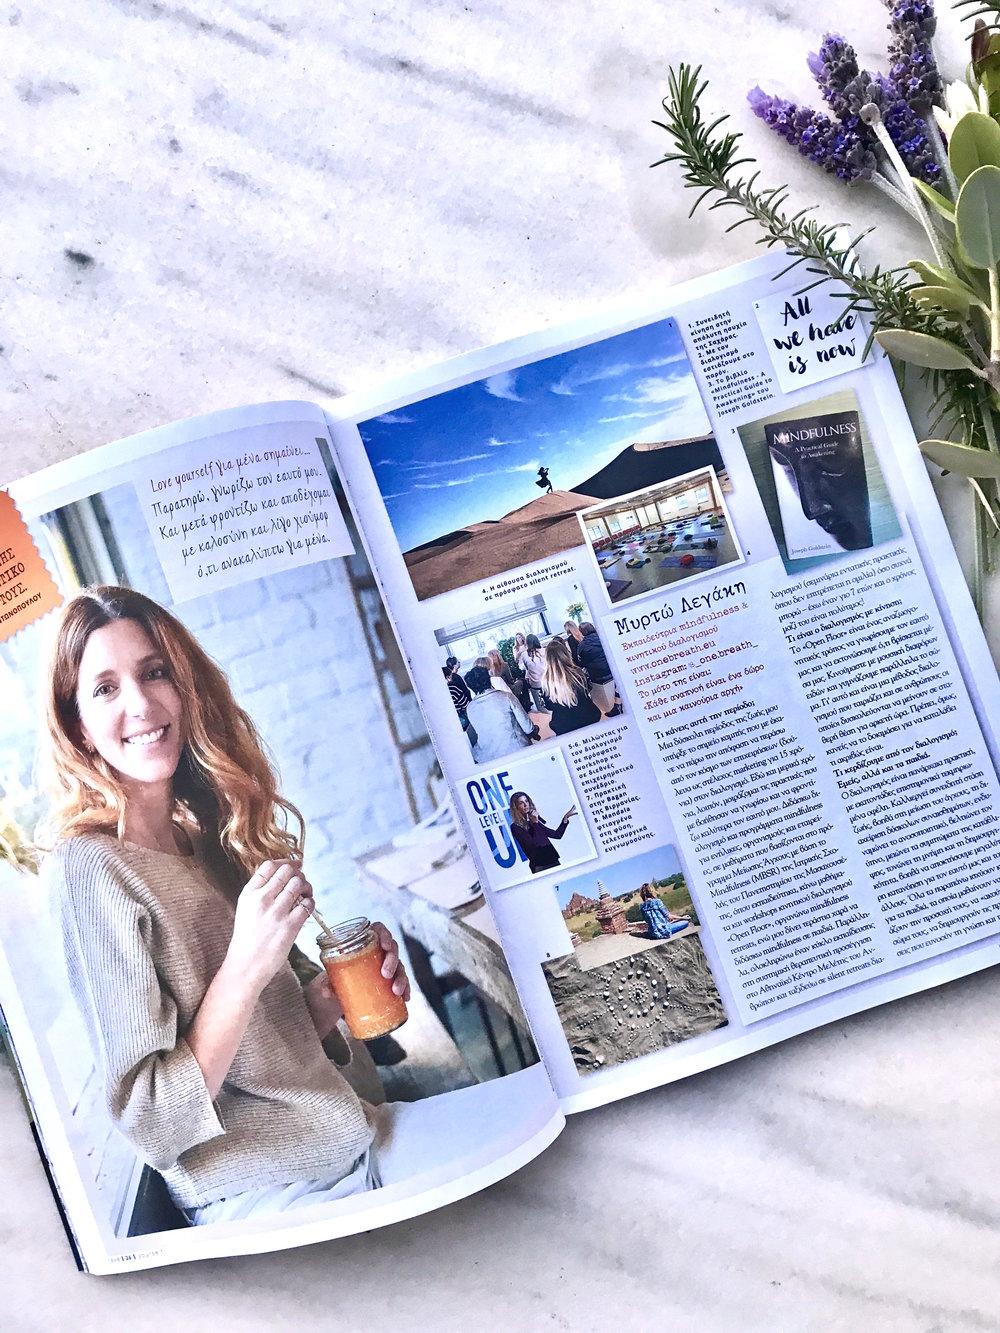 LOVE YOURSELF MAGAZINE | KAΘΗΜΕΡΙΝΗ    Συνέντευξη για το δεύτερο τεύχος του    Love Yourself Magazine    που συνοδεύει την Καθημερινή της Κυριακής, μιλώντας για το διαλογισμό.